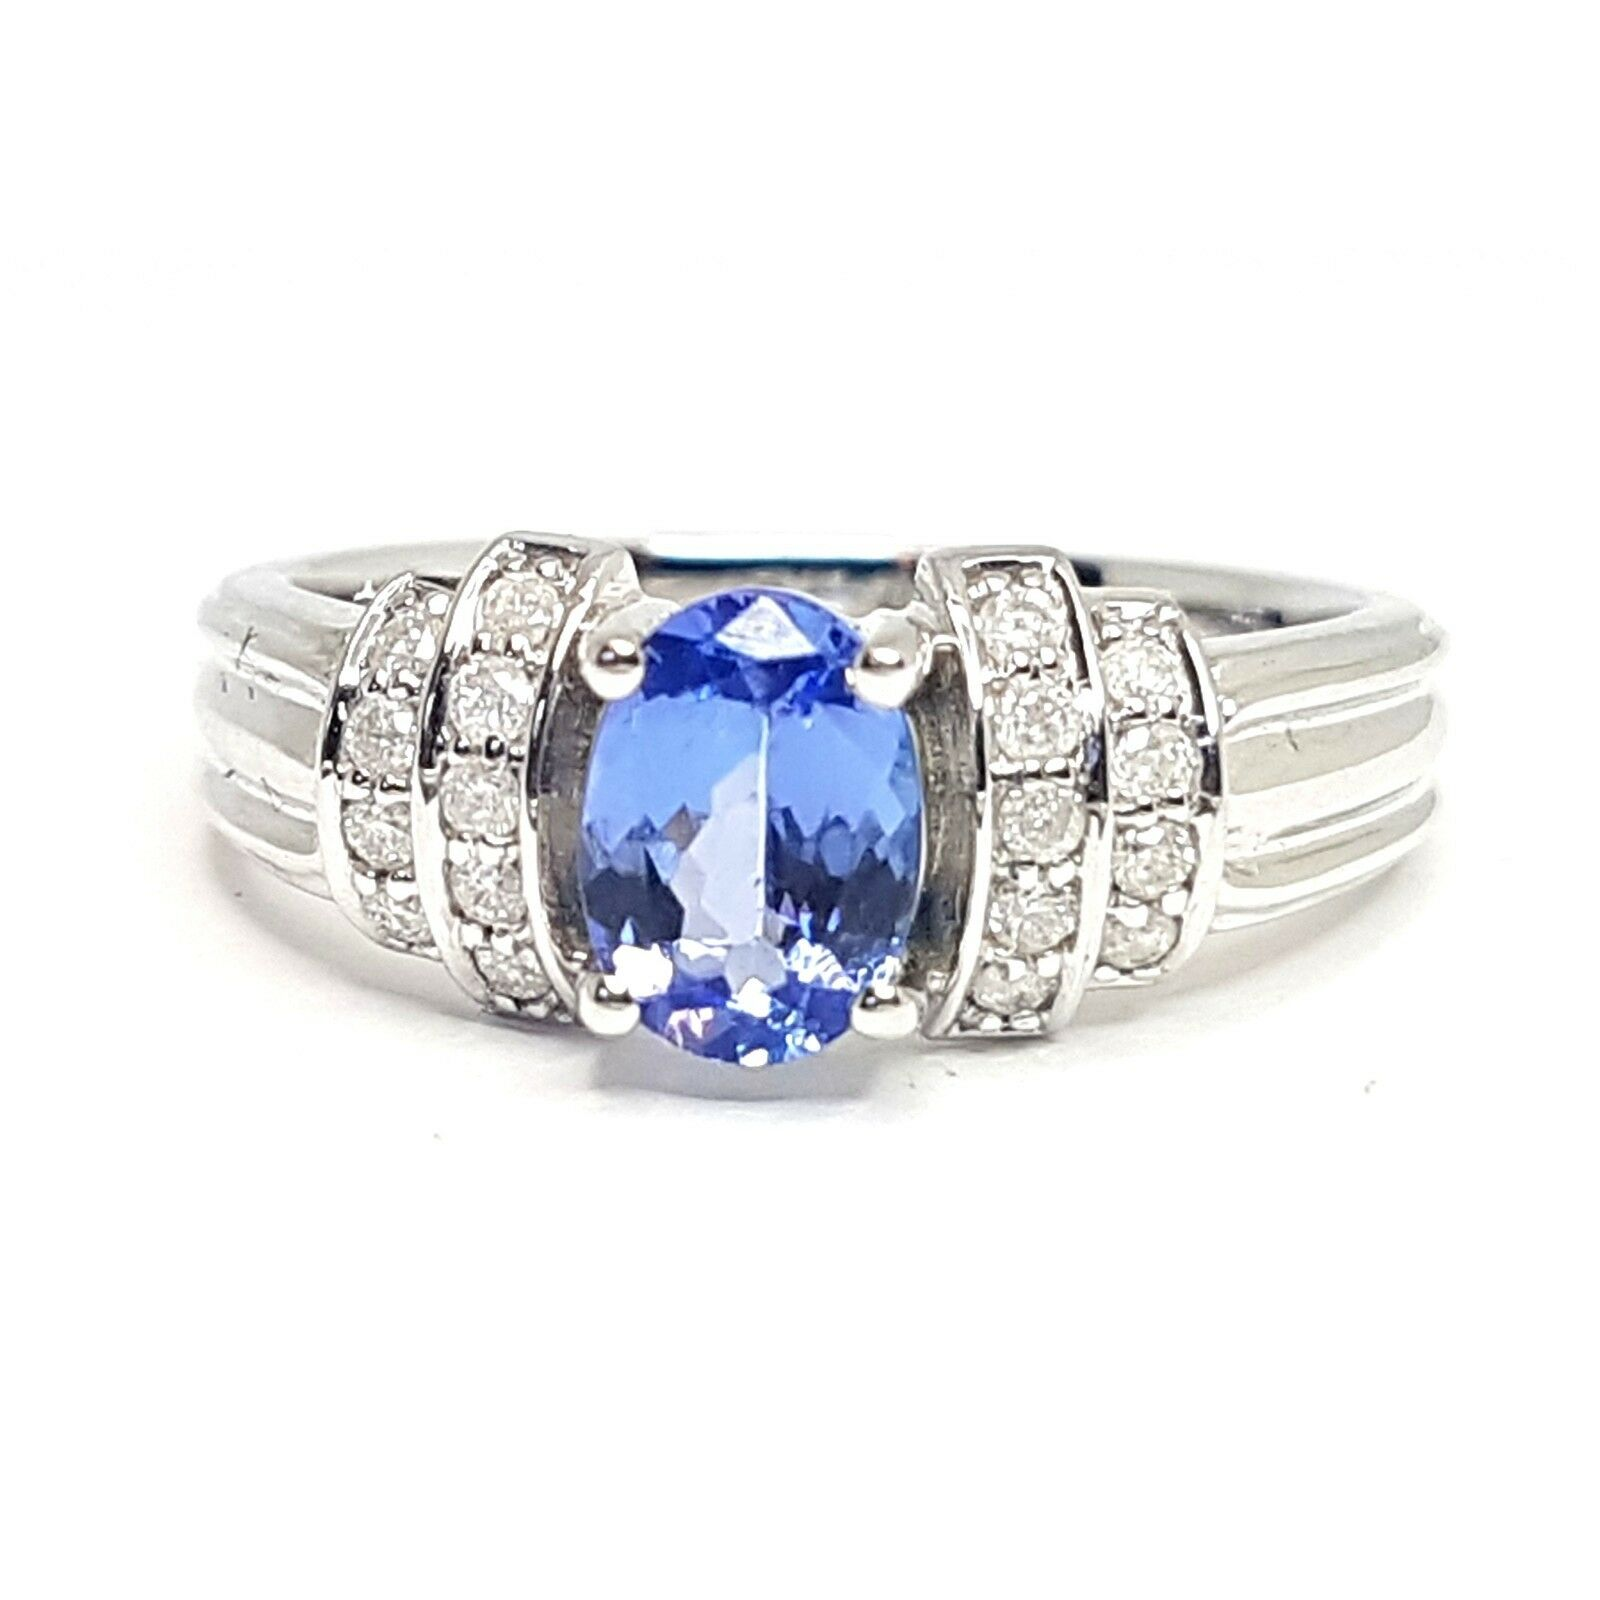 1.00 Ct Tanzanite And Diamond Ring in White gold